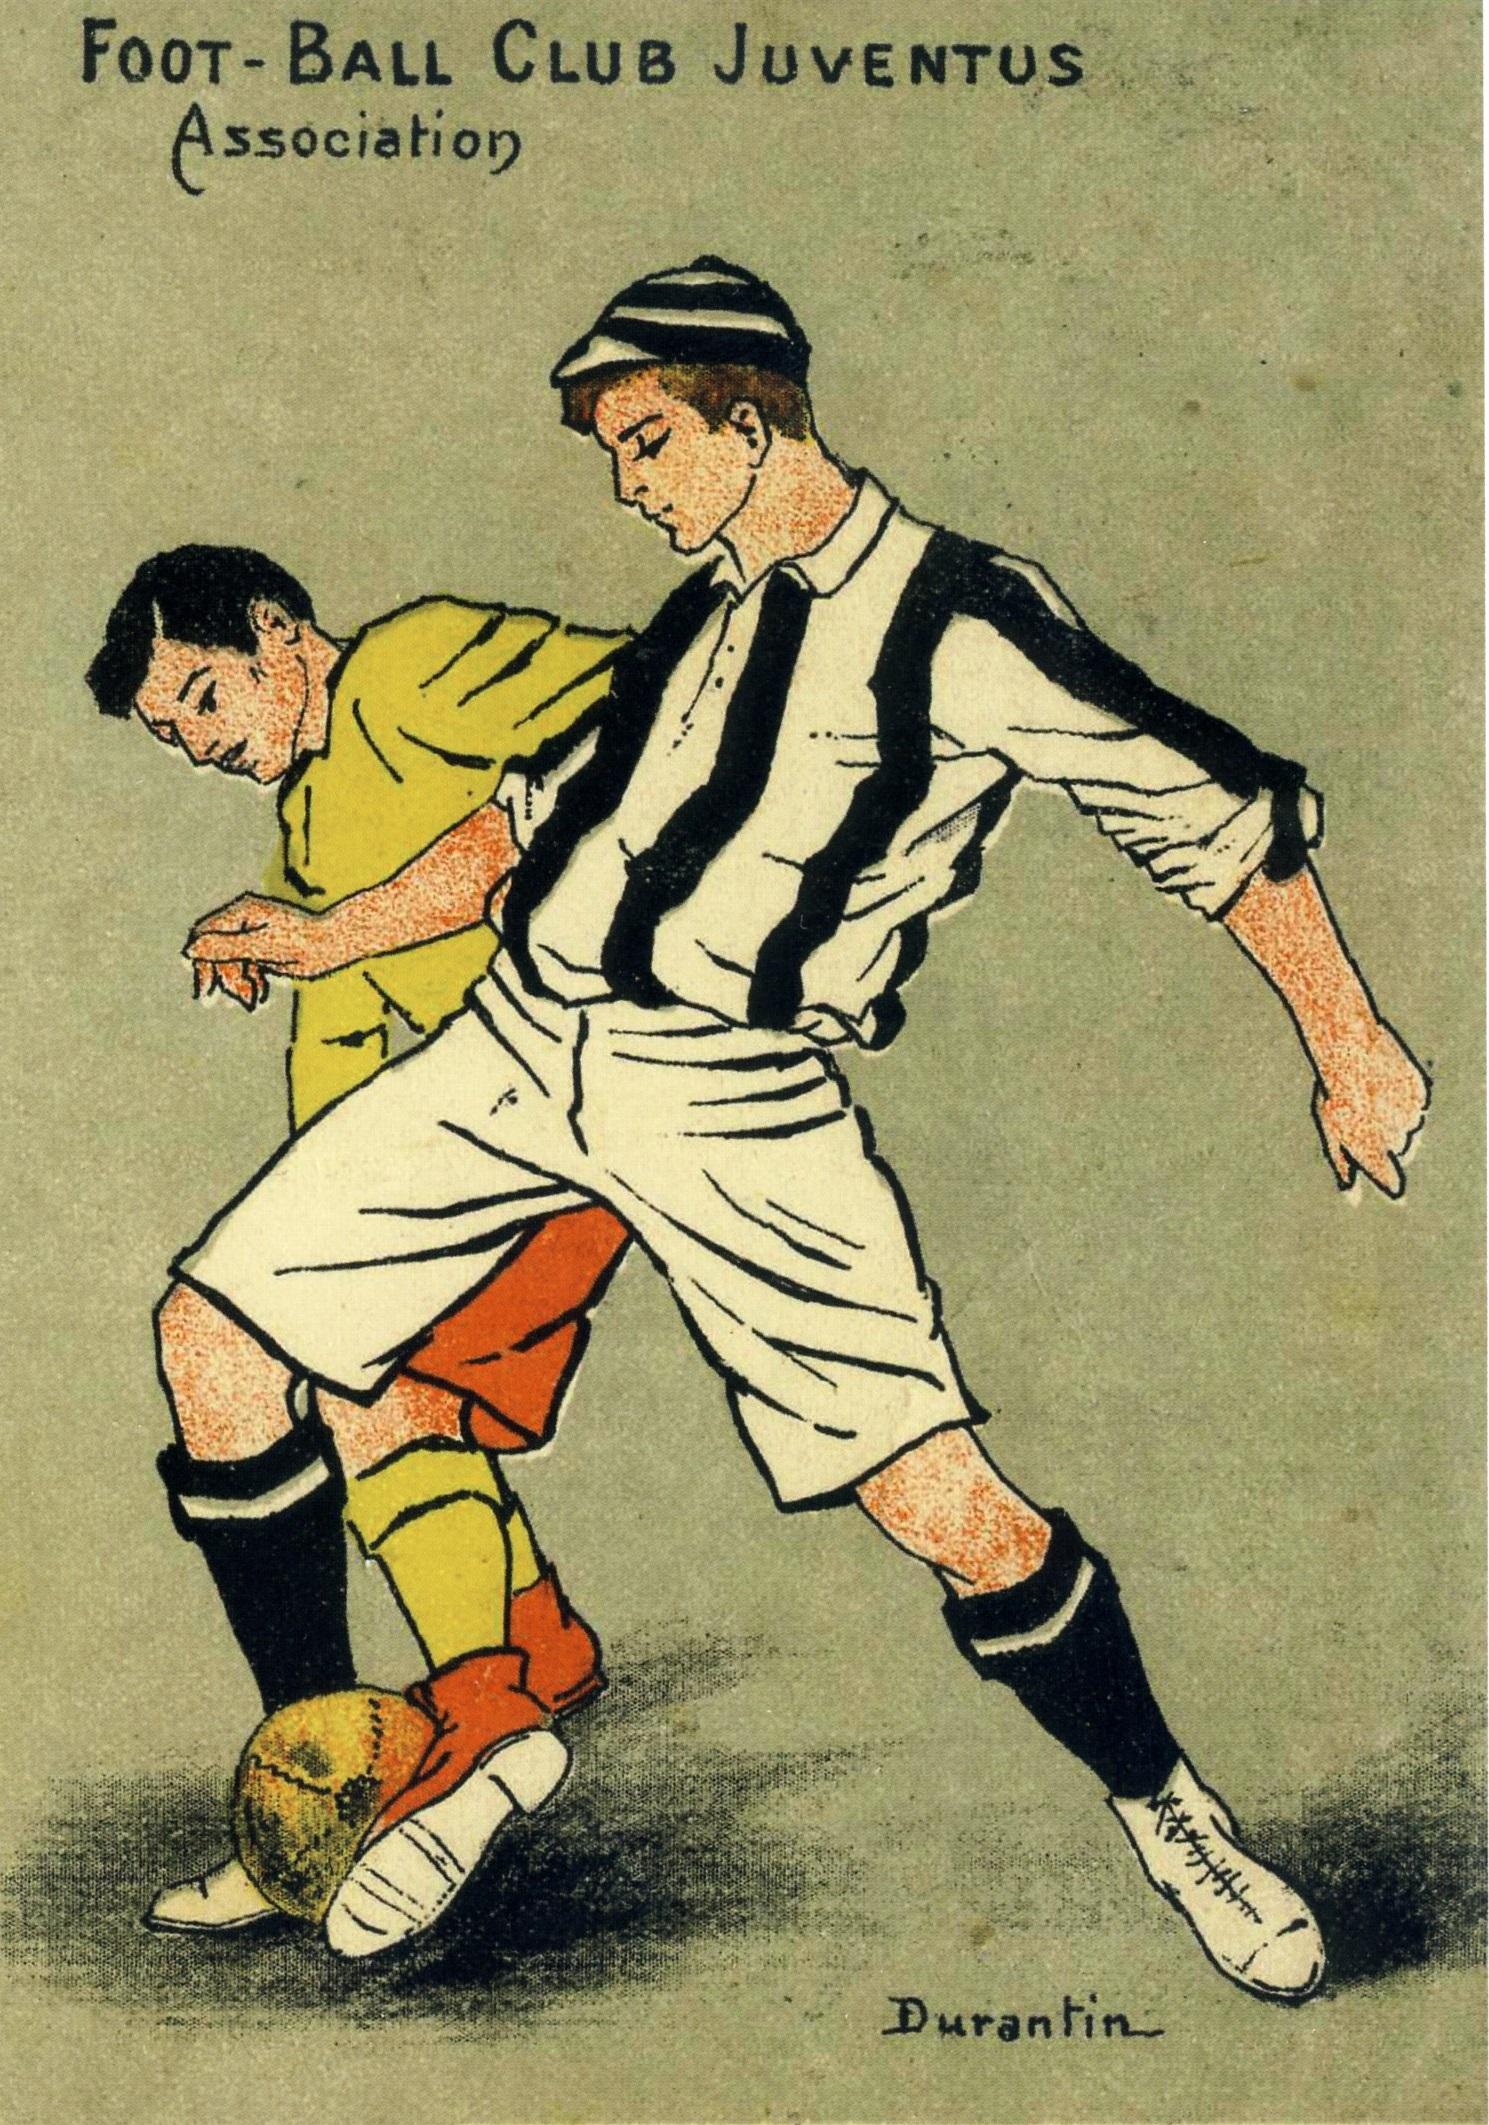 Filedm Durante Foot Ball Club Juventus Association 1903